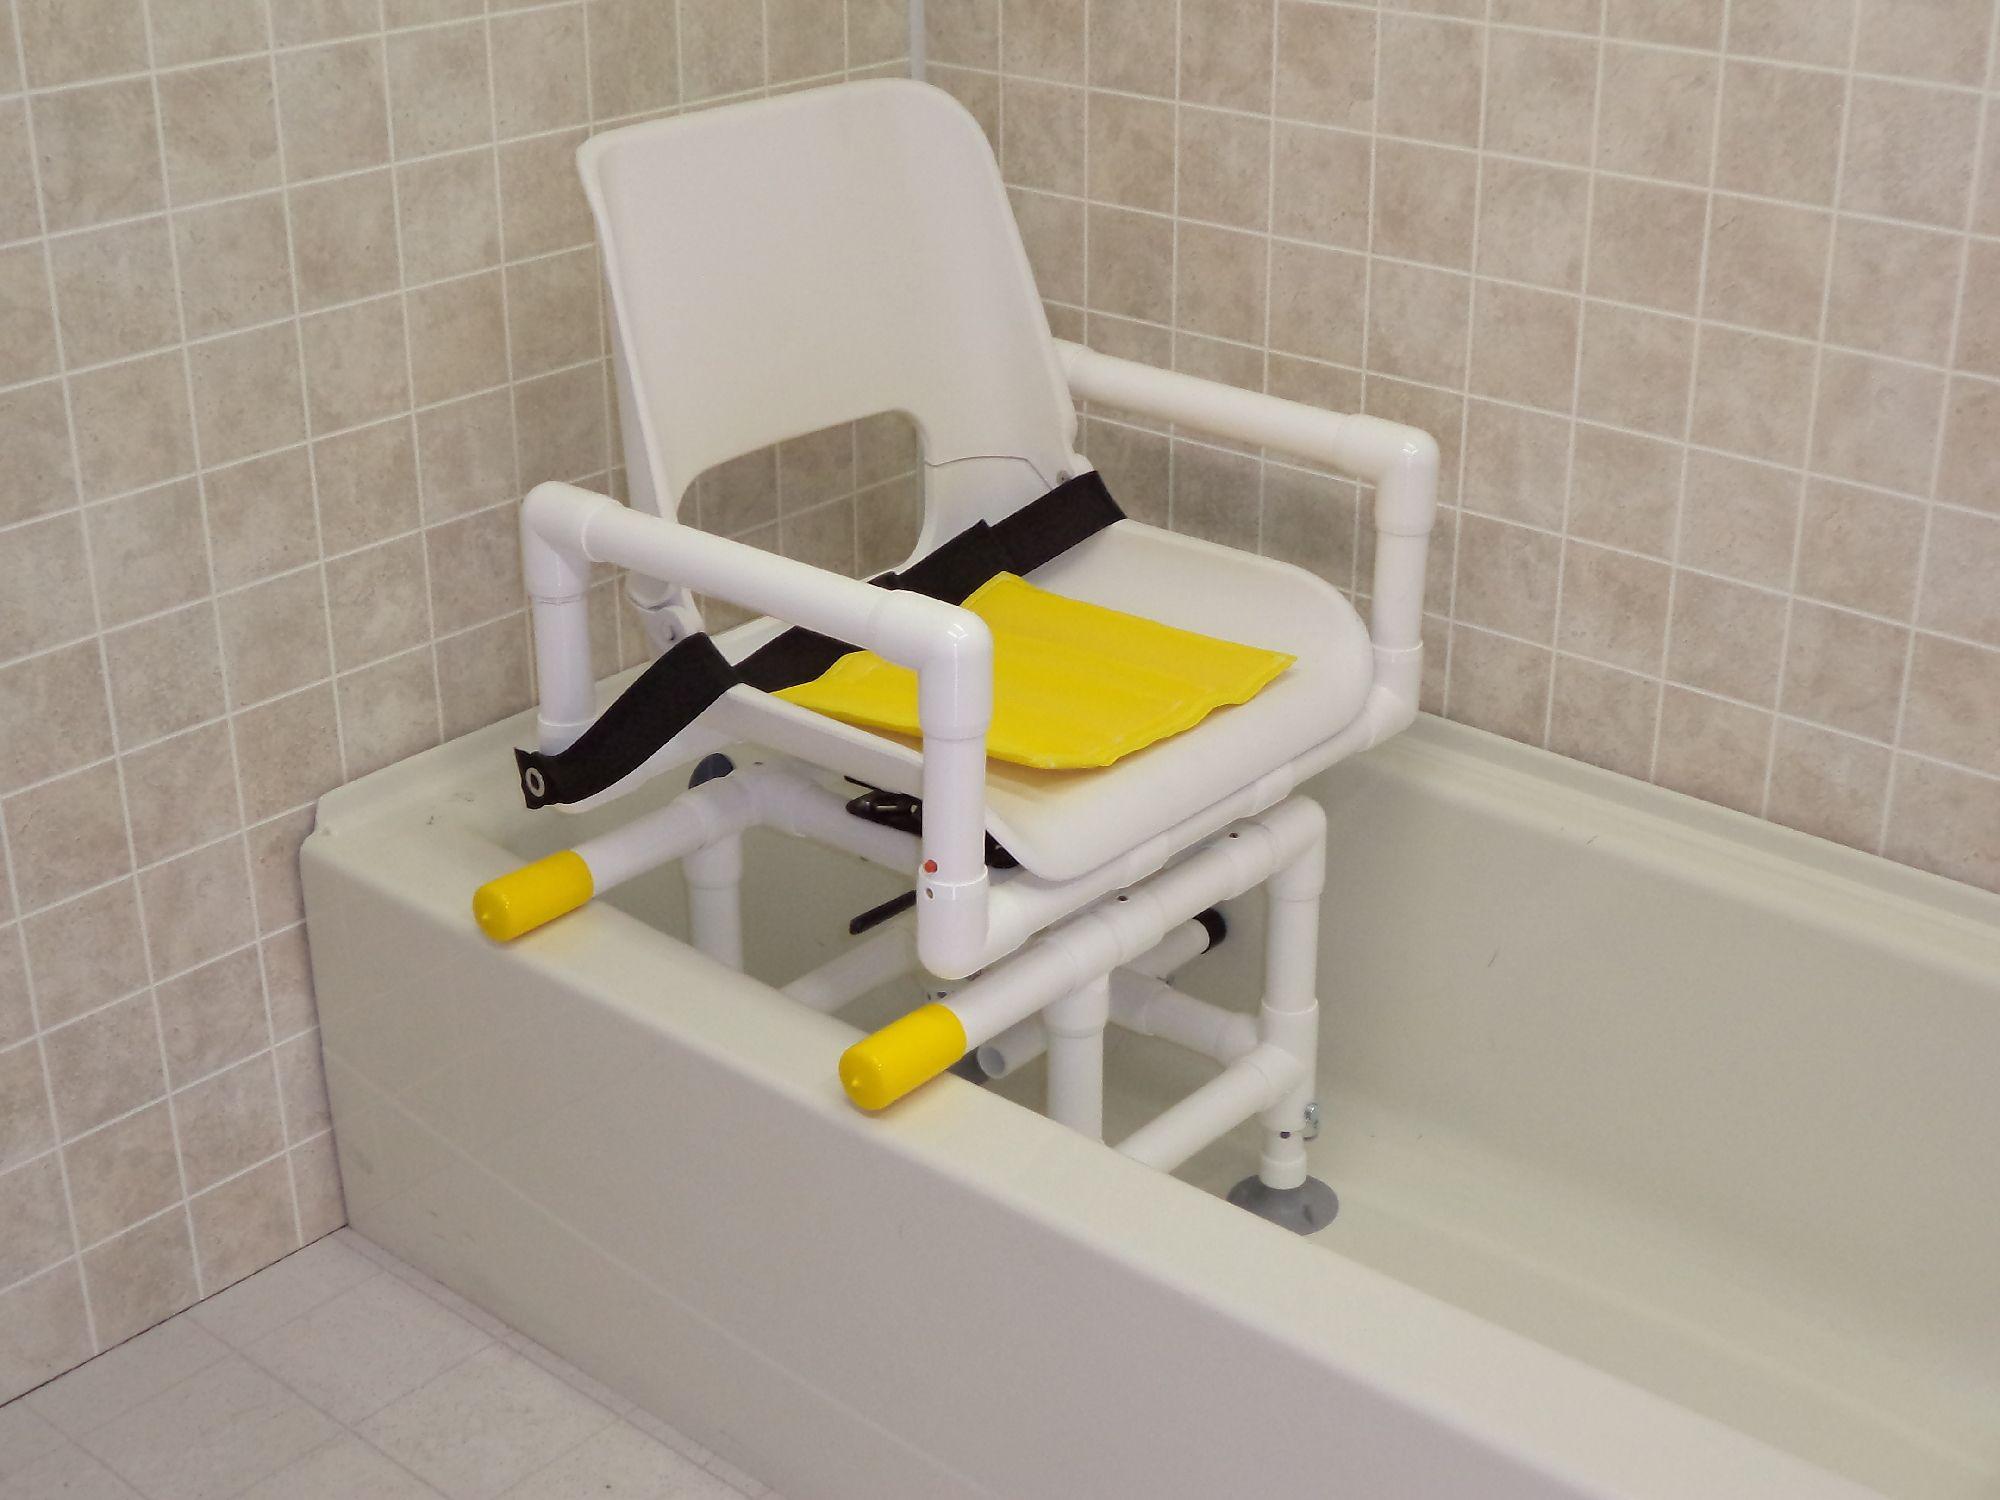 The ICC Swivel Bath Chair has an ergonomic seat that rotates 360 ...